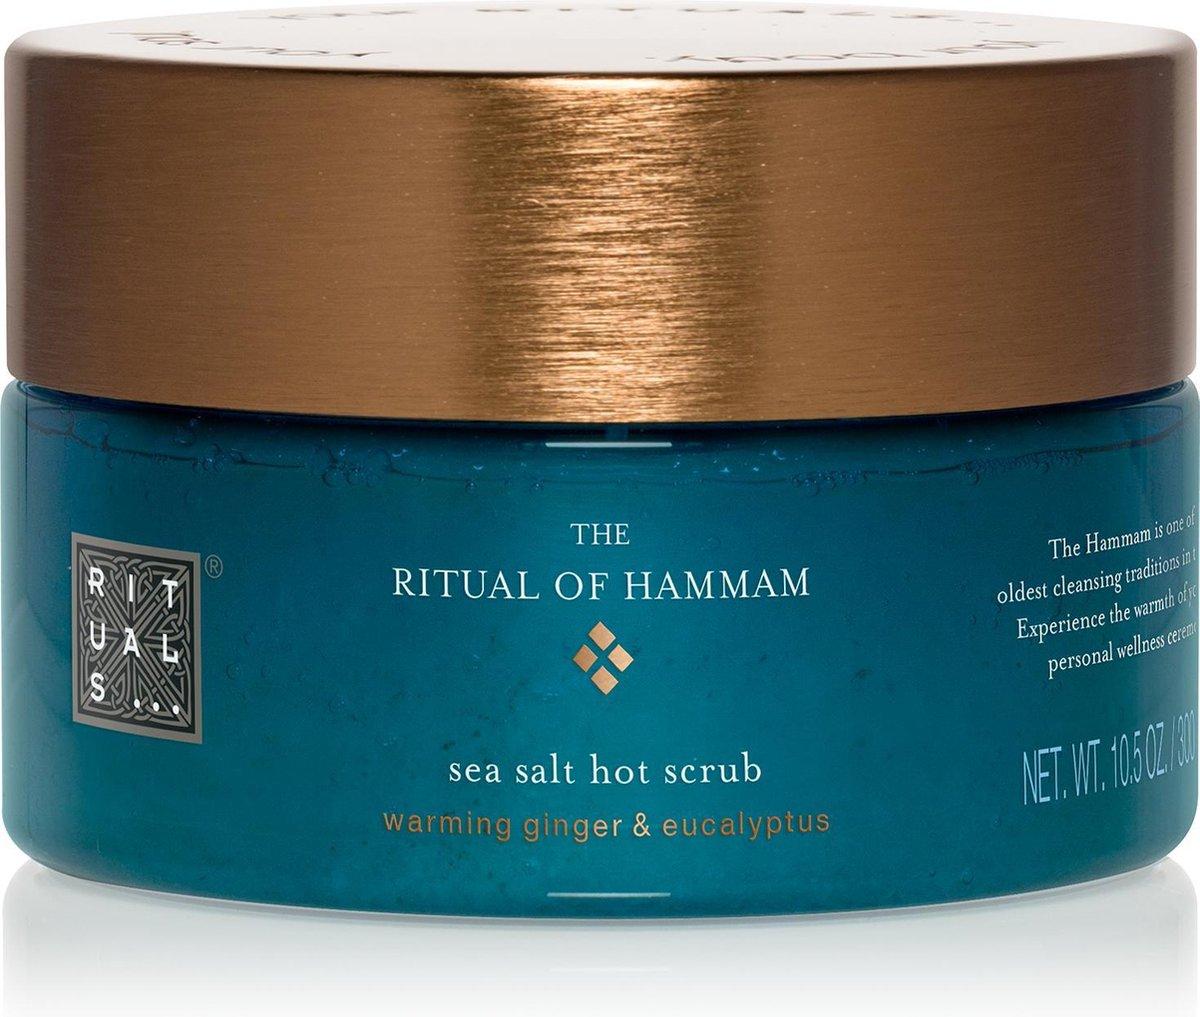 RITUALS The Ritual of Hammam Body Scrub - 300 ml